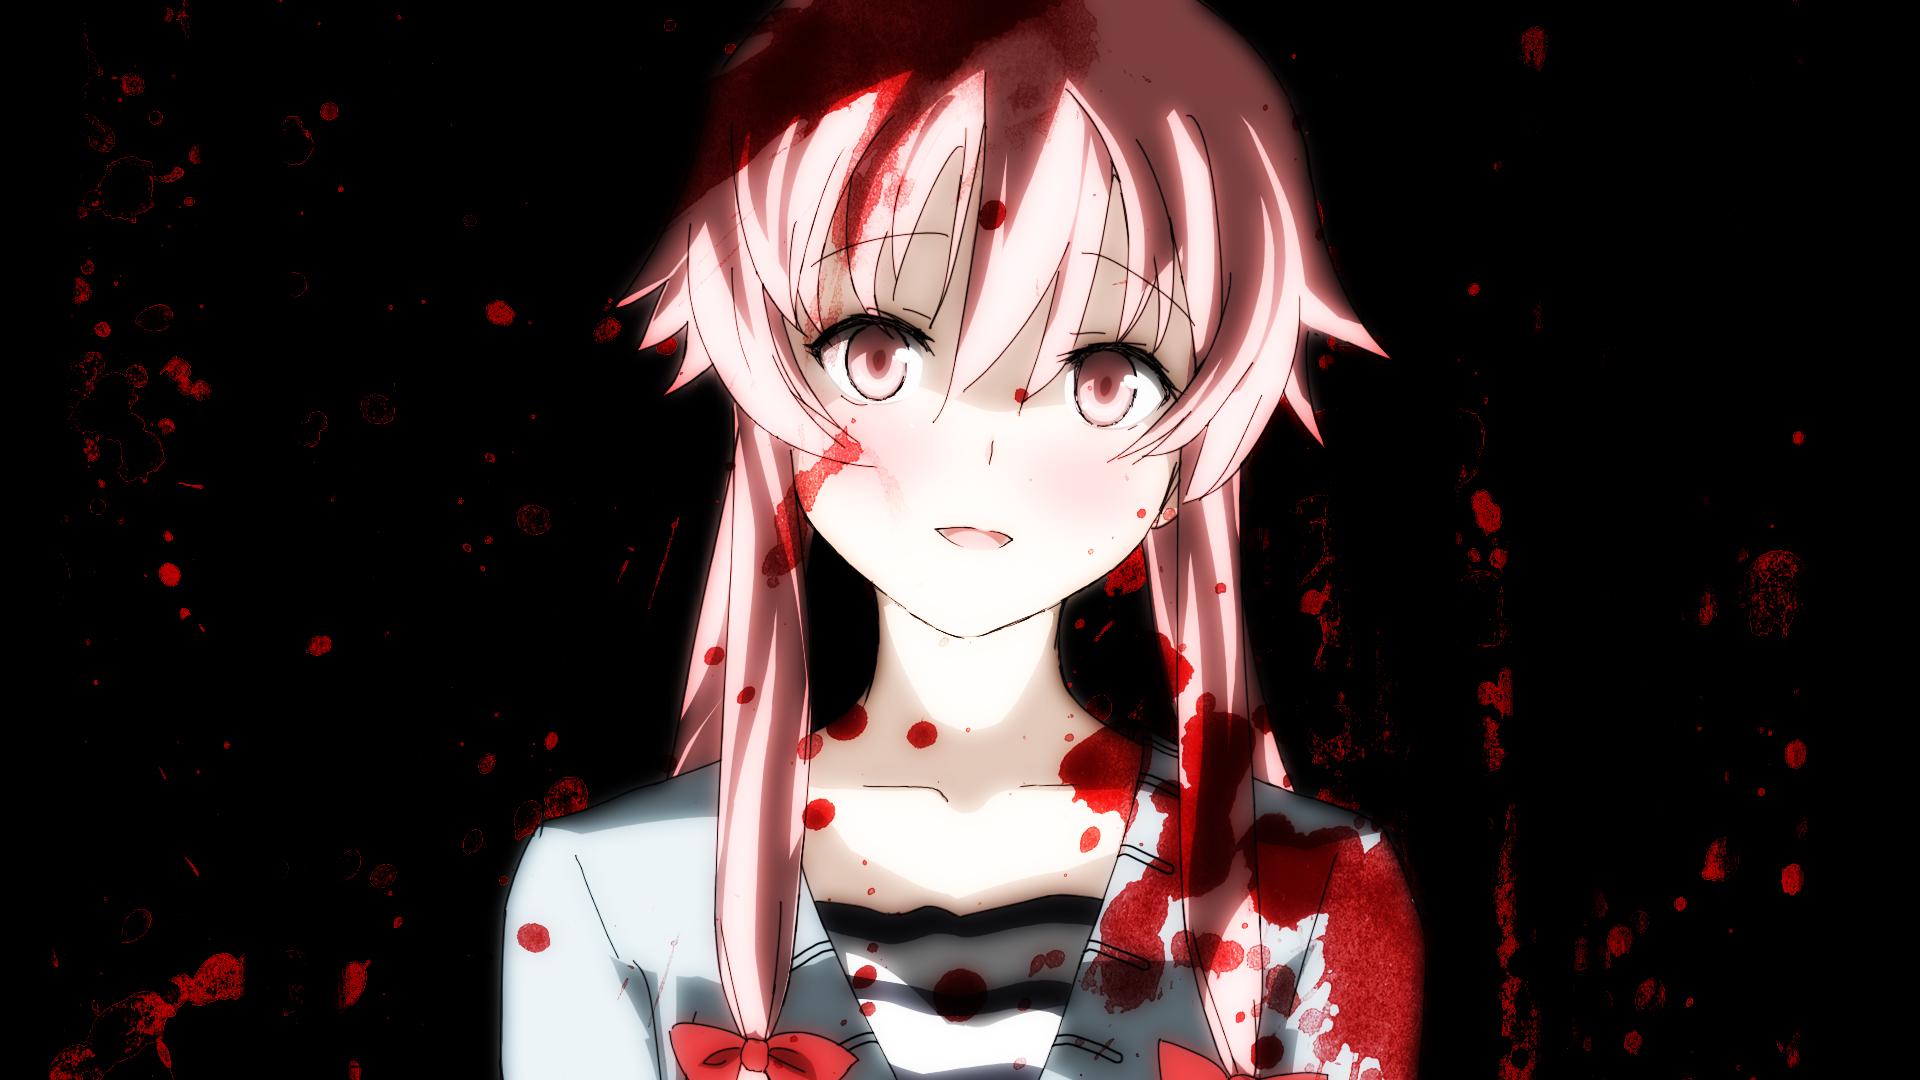 Anime Red Twintails Mirai Nikki Gasai Yuno Darkness 1920x1080 Px